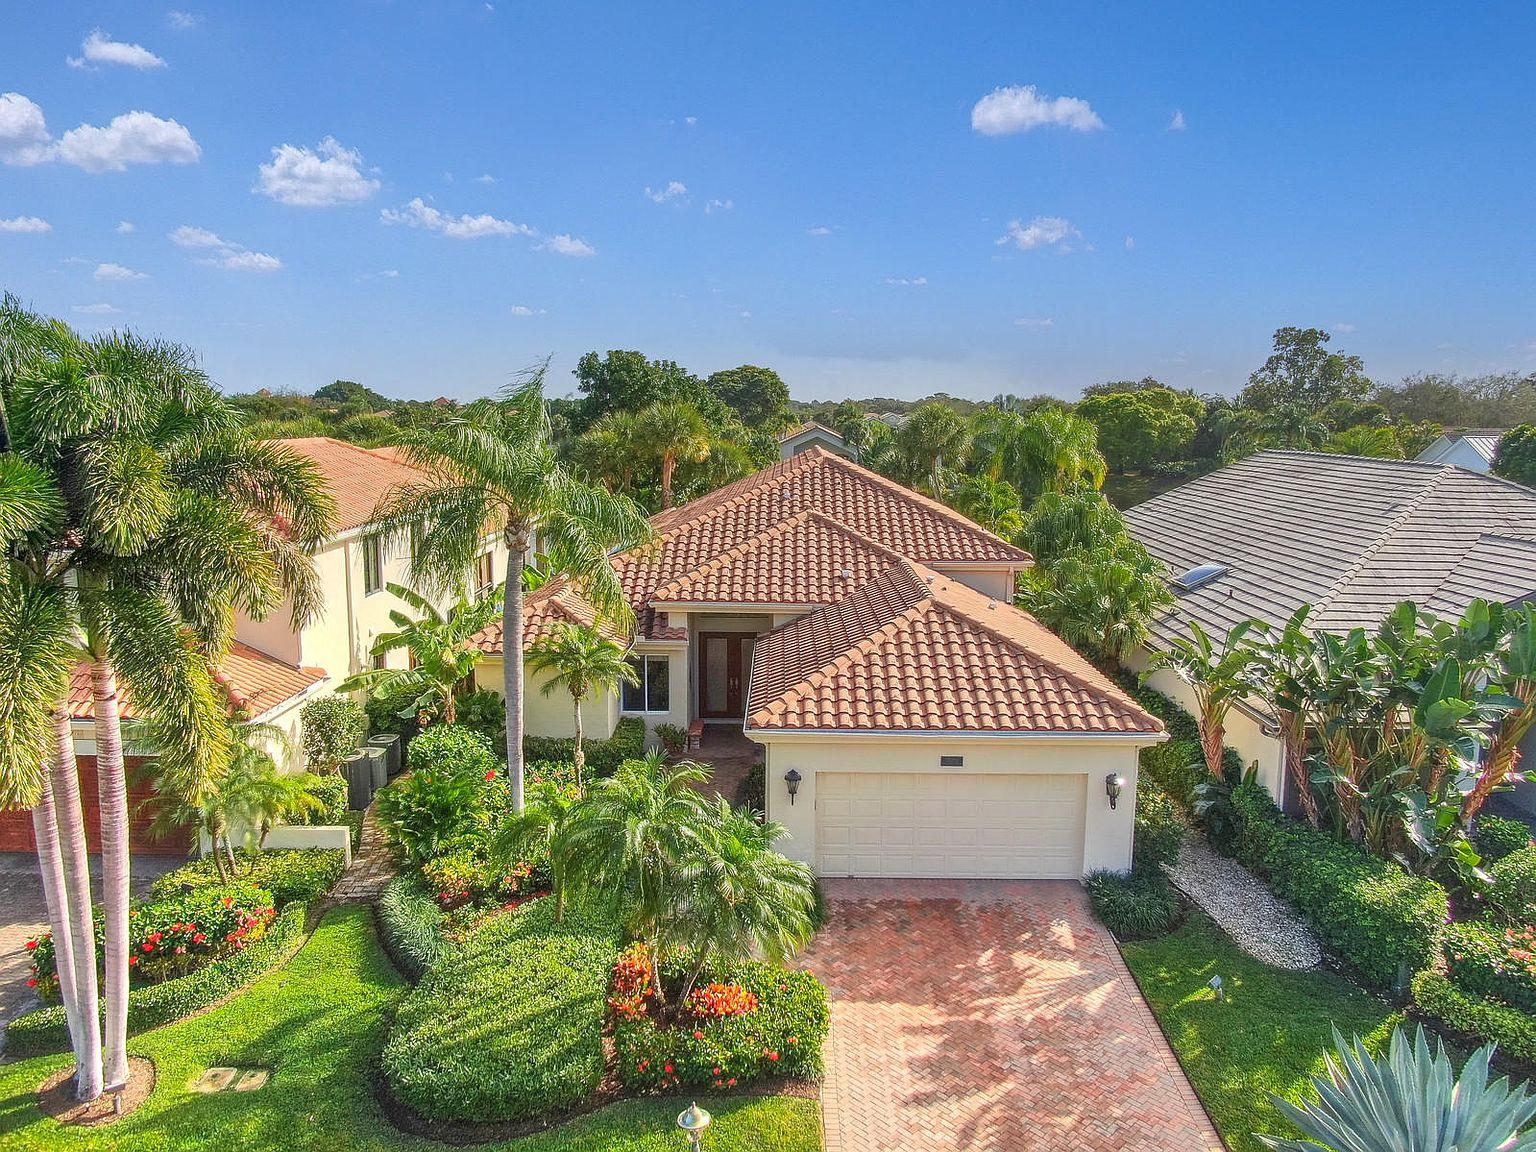 2f351710dcbdbc112d07935b346143c0 cc ft 1536 - Westwood Gardens Palm Beach Gardens For Rent